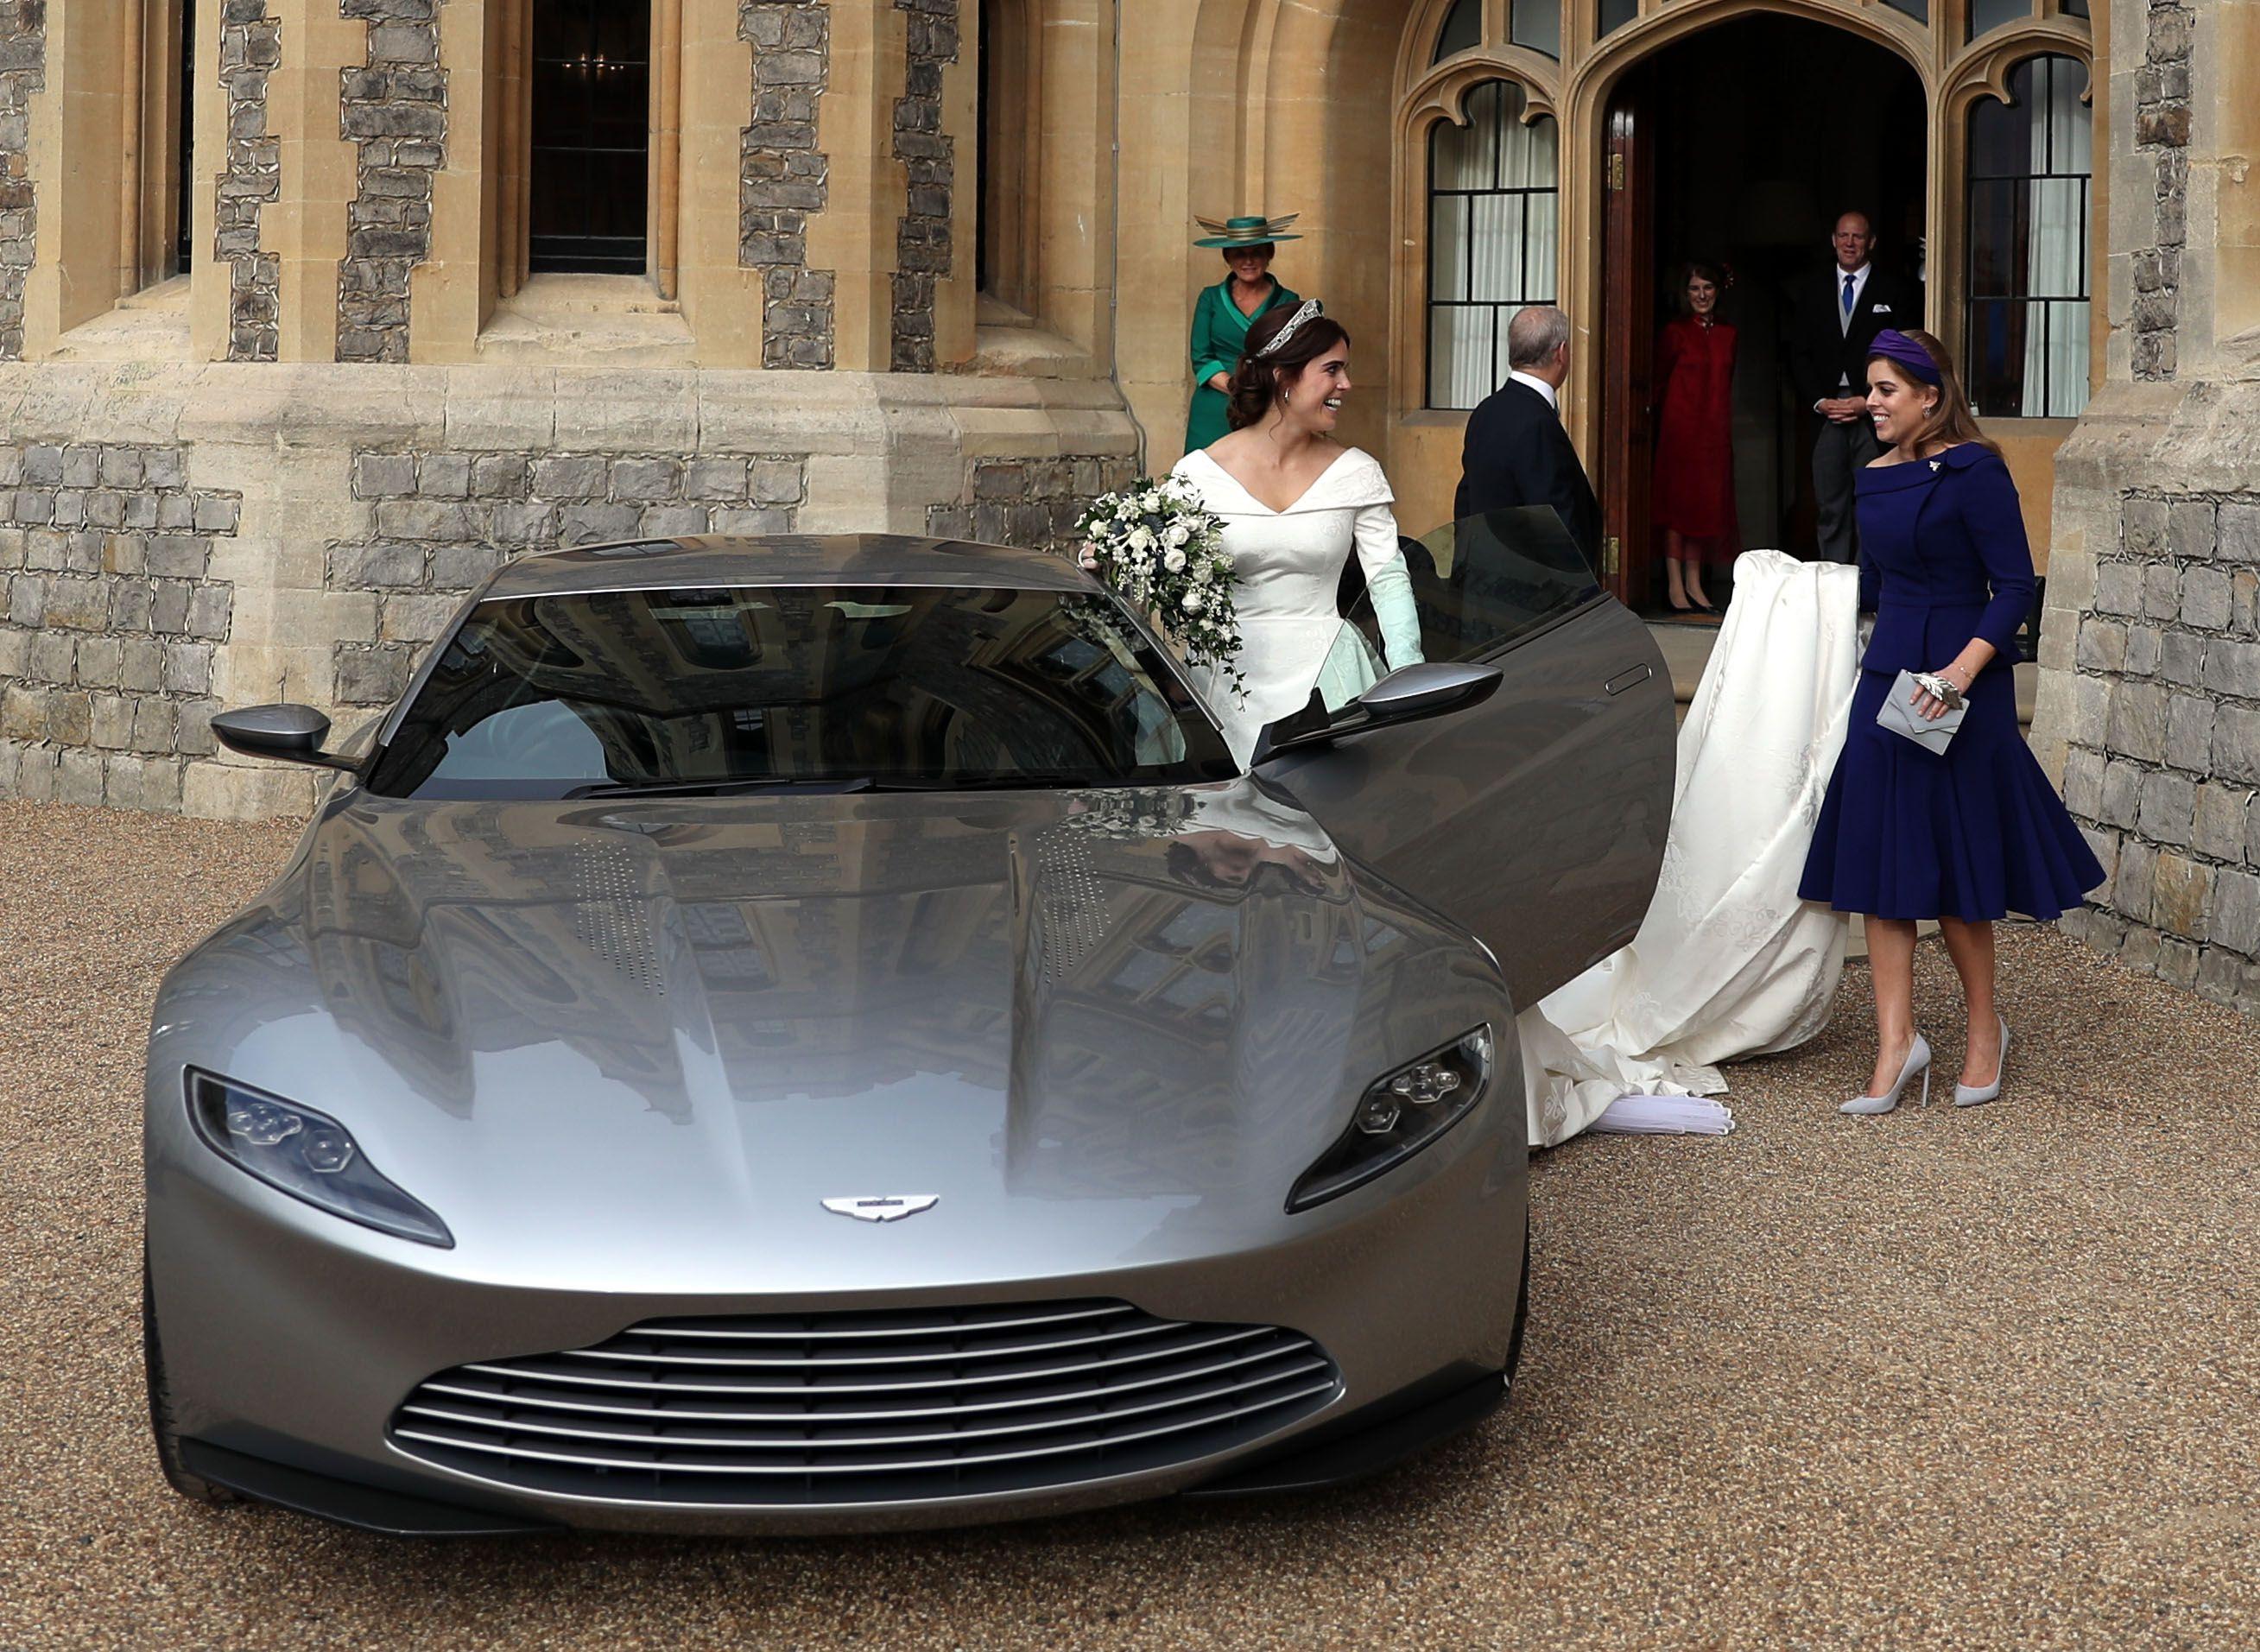 Princess Eugenie's Royal Wedding Car Is James Bond's Aston Martin DB10